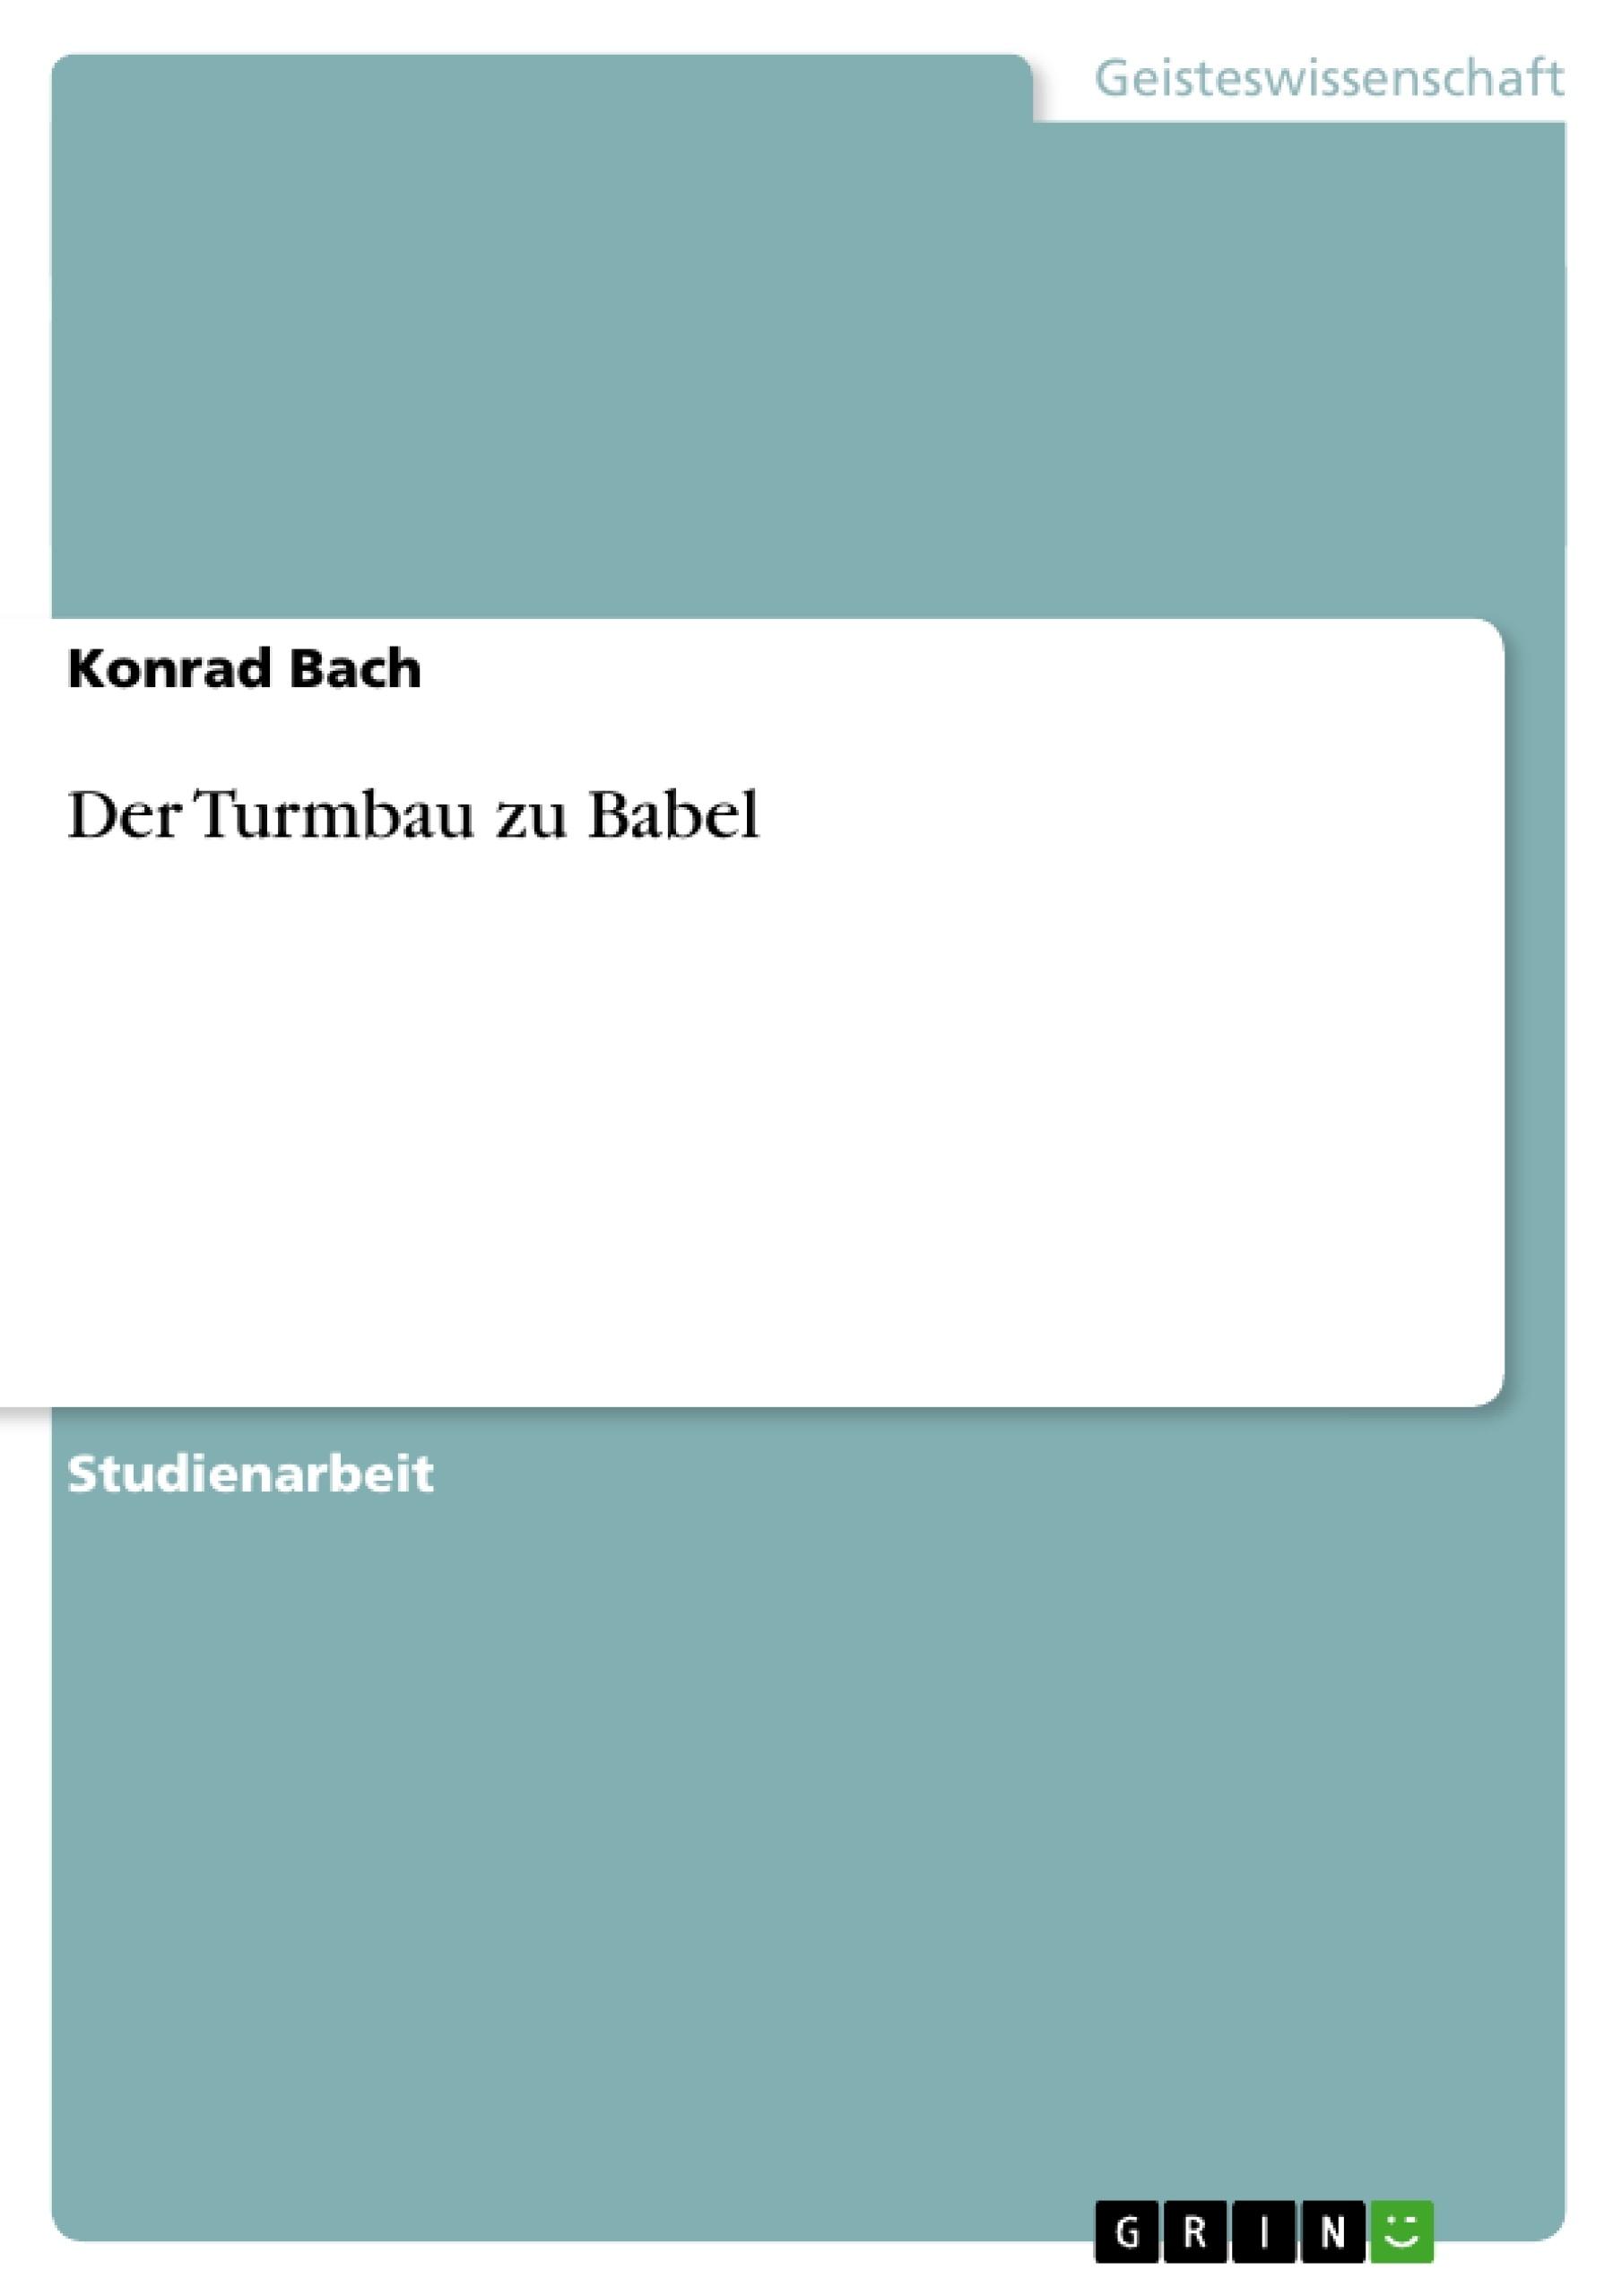 Titel: Der Turmbau zu Babel